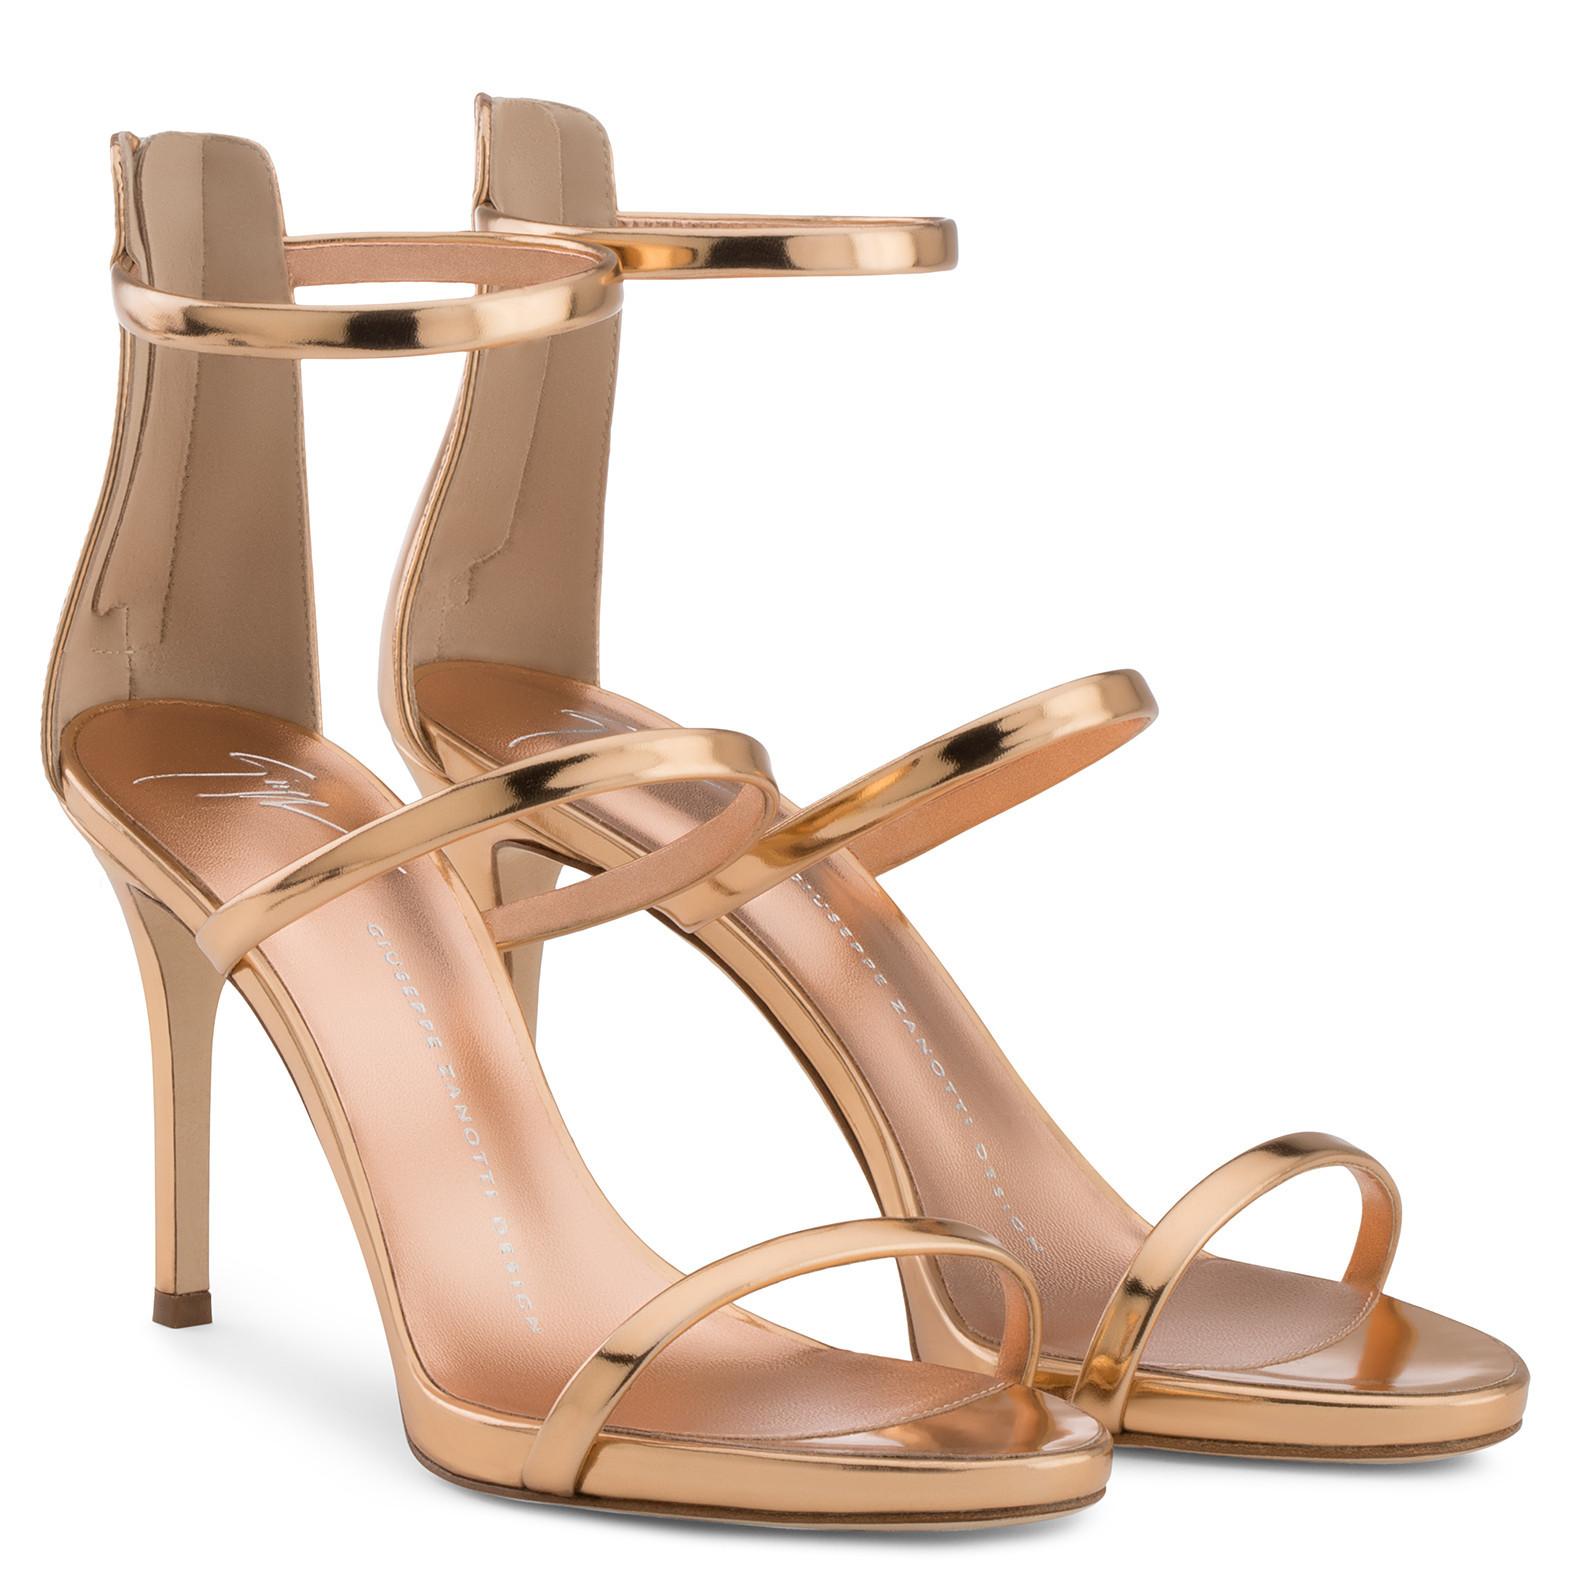 Harmony 90 - Sandals - Gold | Giuseppe